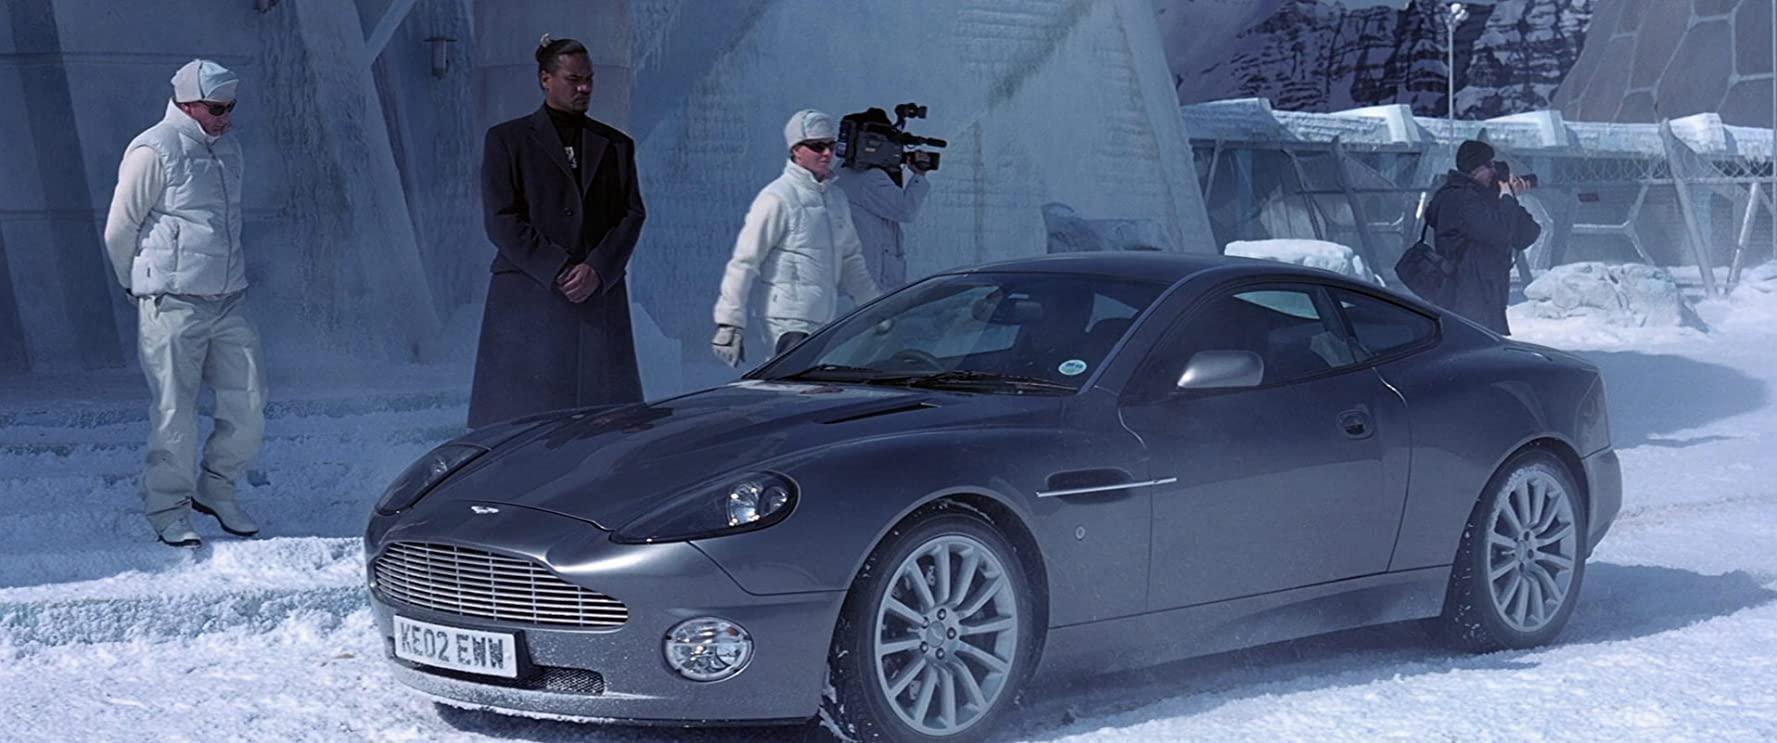 Aston Martin Didn T Want To Let Pierce Brosnan Keep The James Bond V12 Vanquish Autoevolution